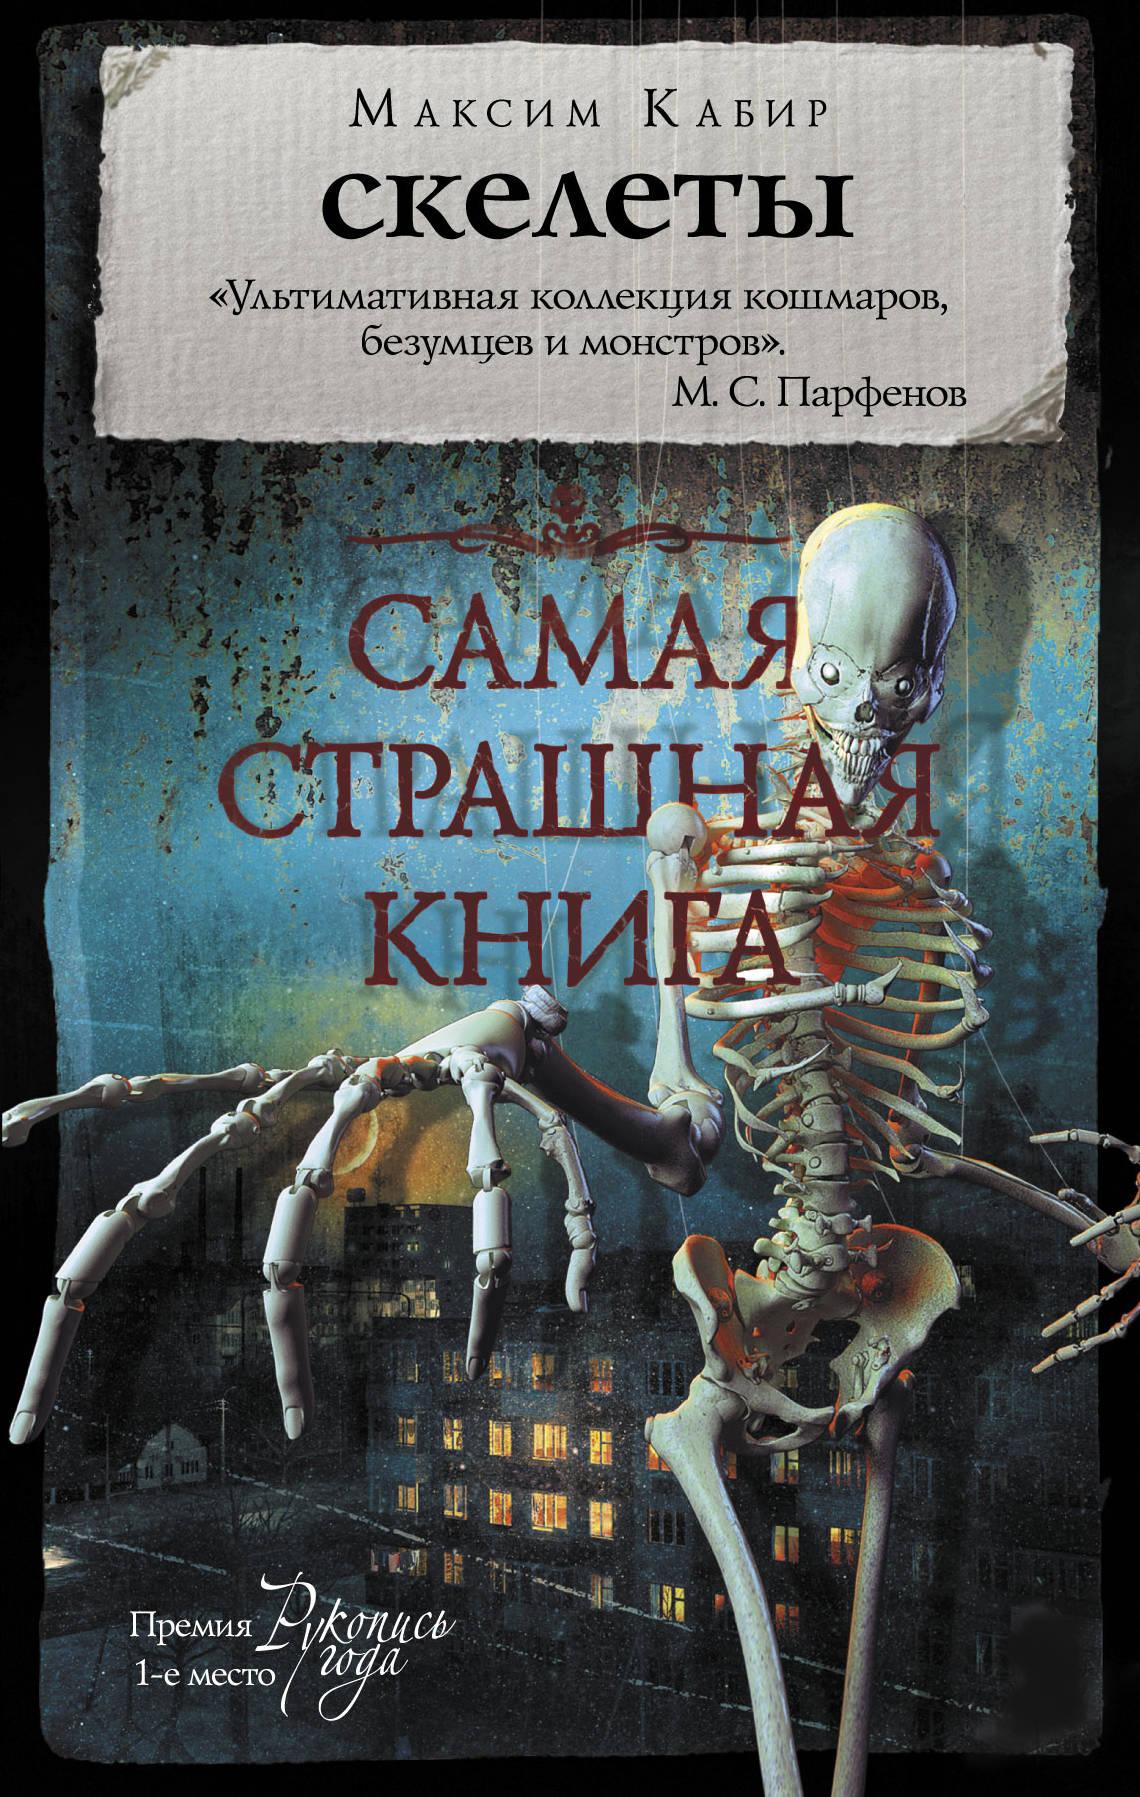 М. А. Кабир Самая страшная книга. Скелеты